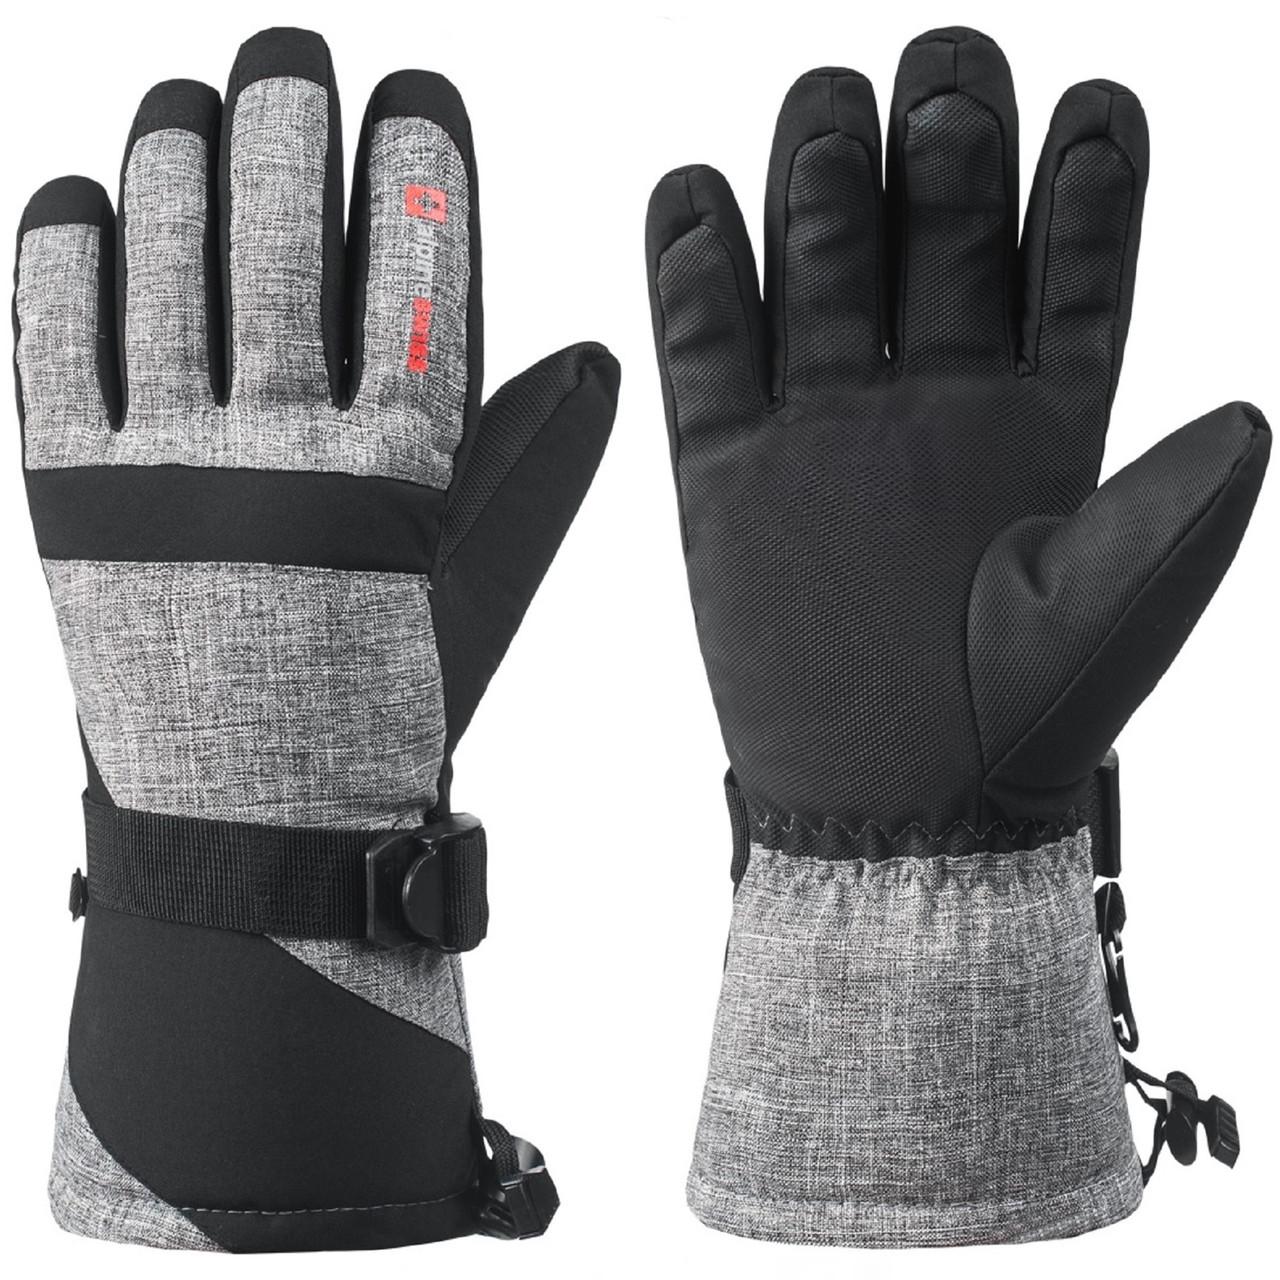 Windbreak and Waterproof Outdoor Sports Gloves Half-fingered Gloves